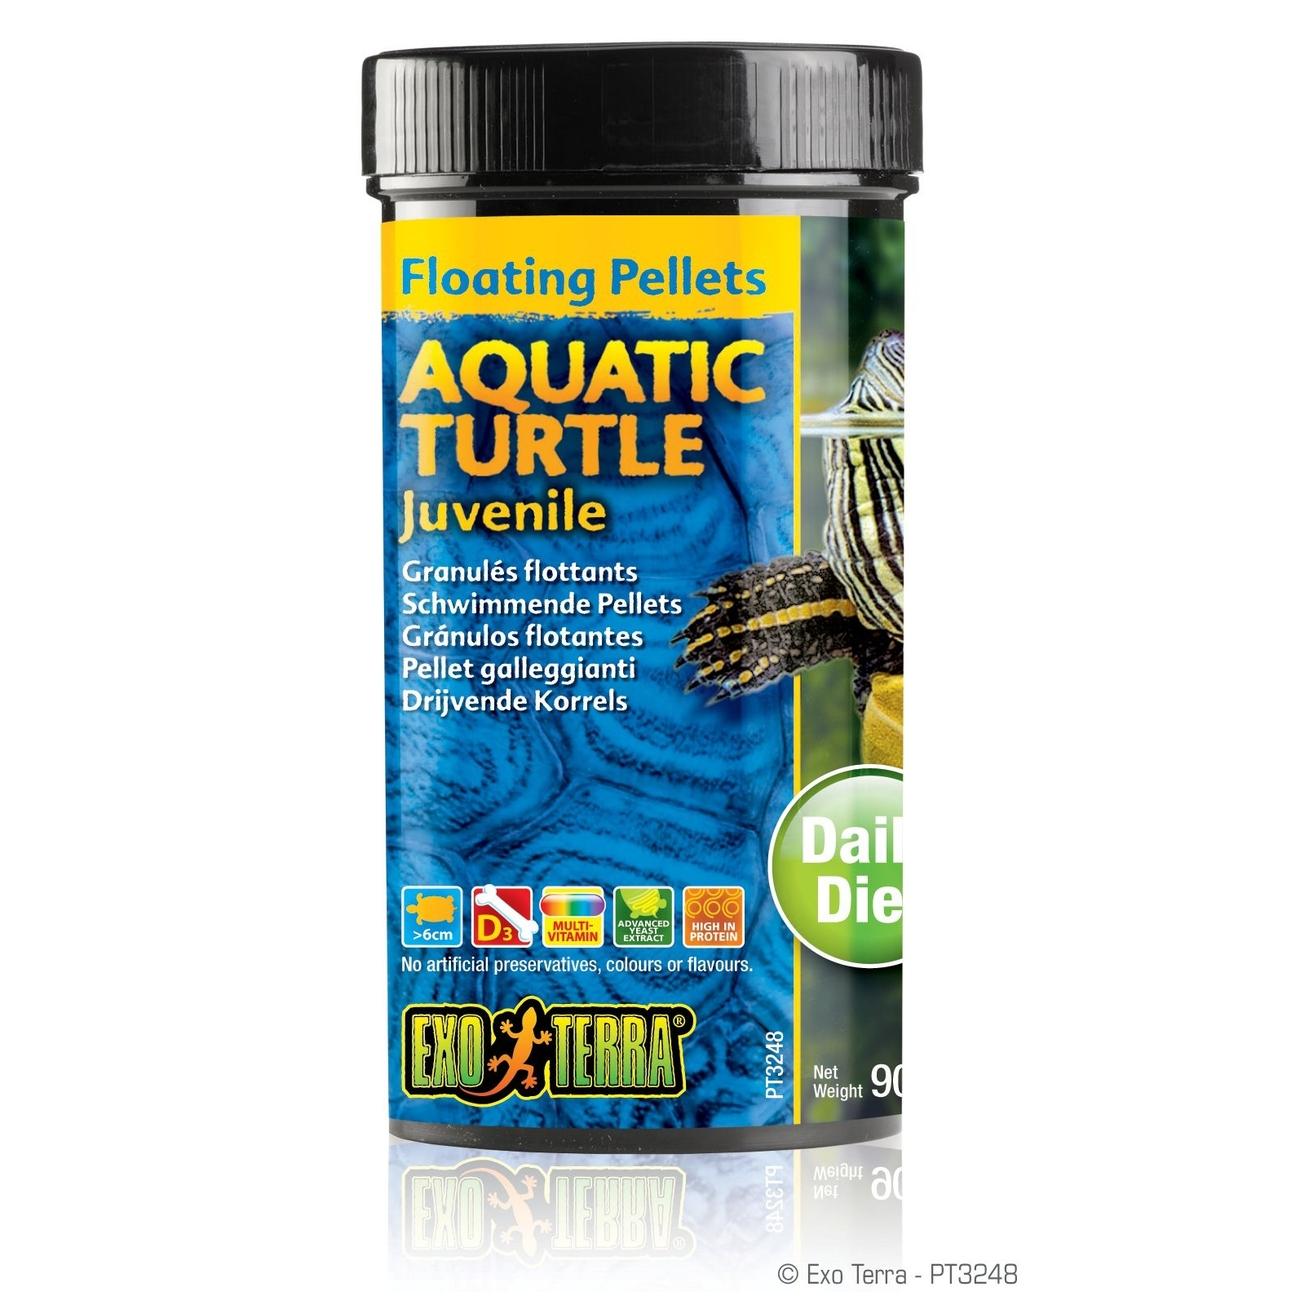 Exo Terra - Aquatic Turtle Juvenile, schwimmende Futter-Pellets Preview Image